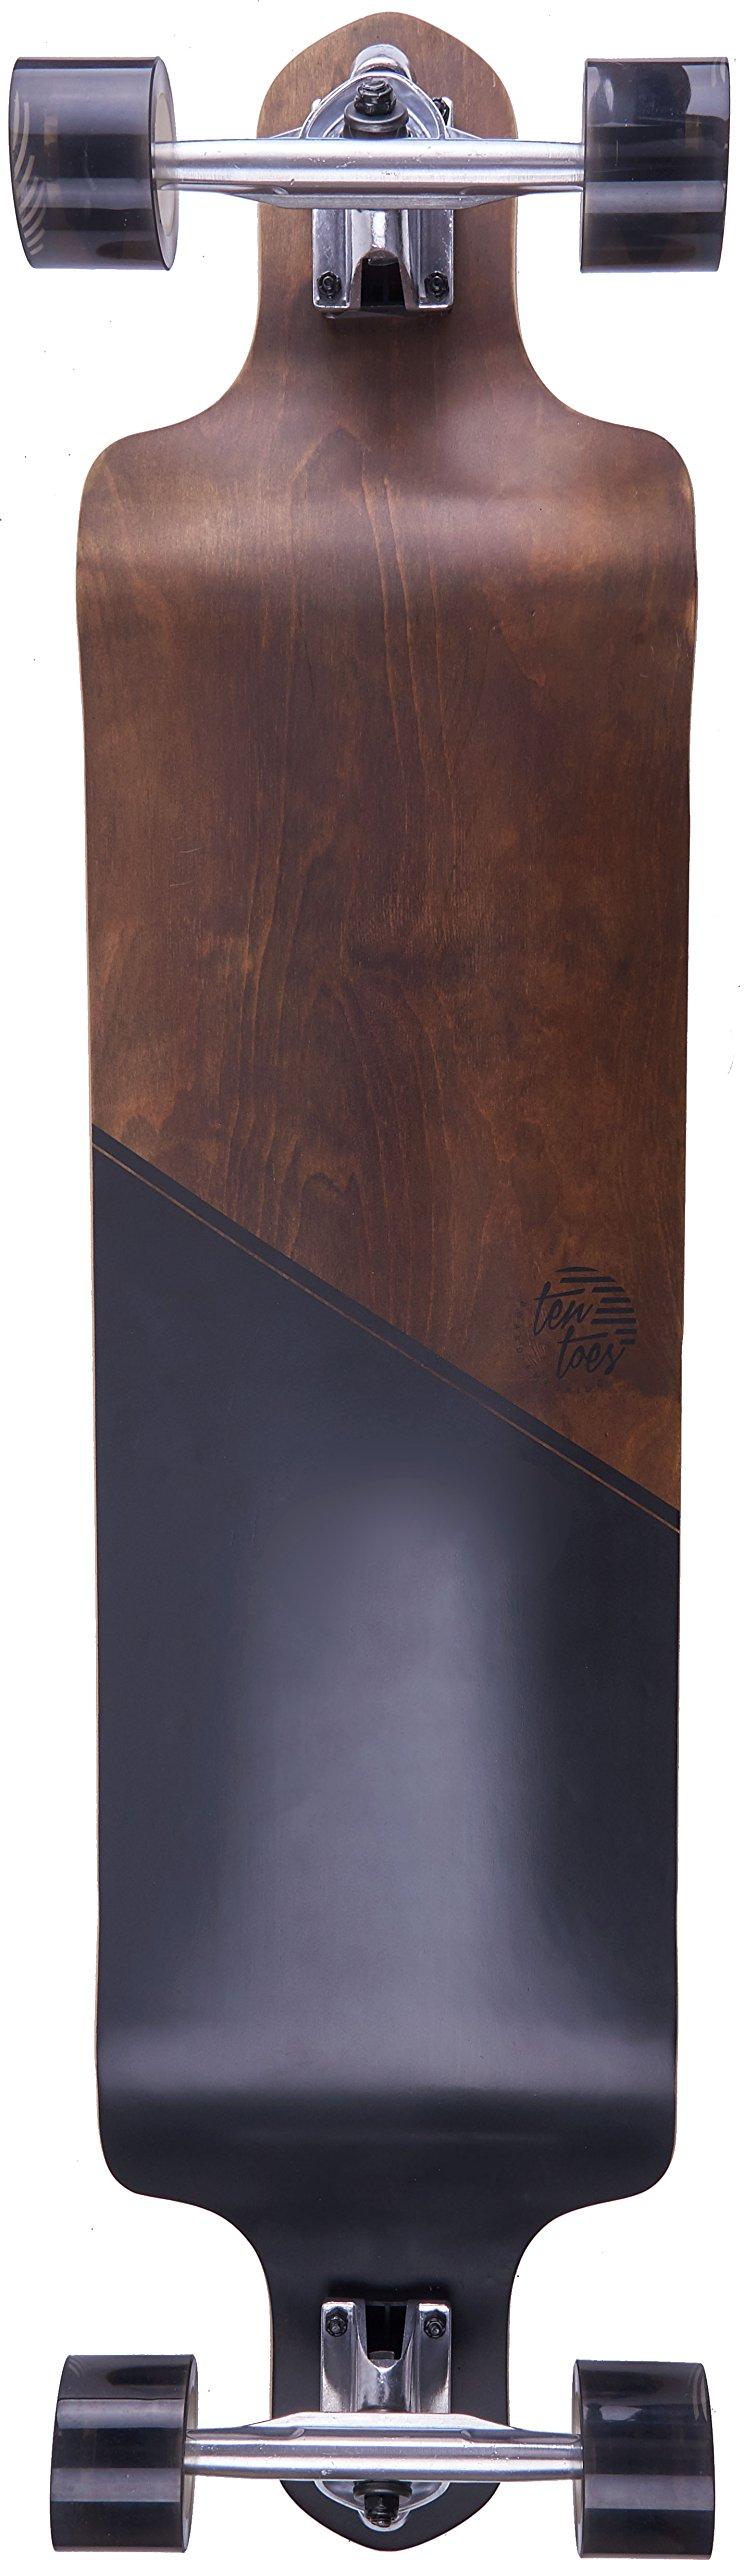 Ten Toes Board Emporium The Drops Drop Down Longboard Dropdown Skateboard, Black